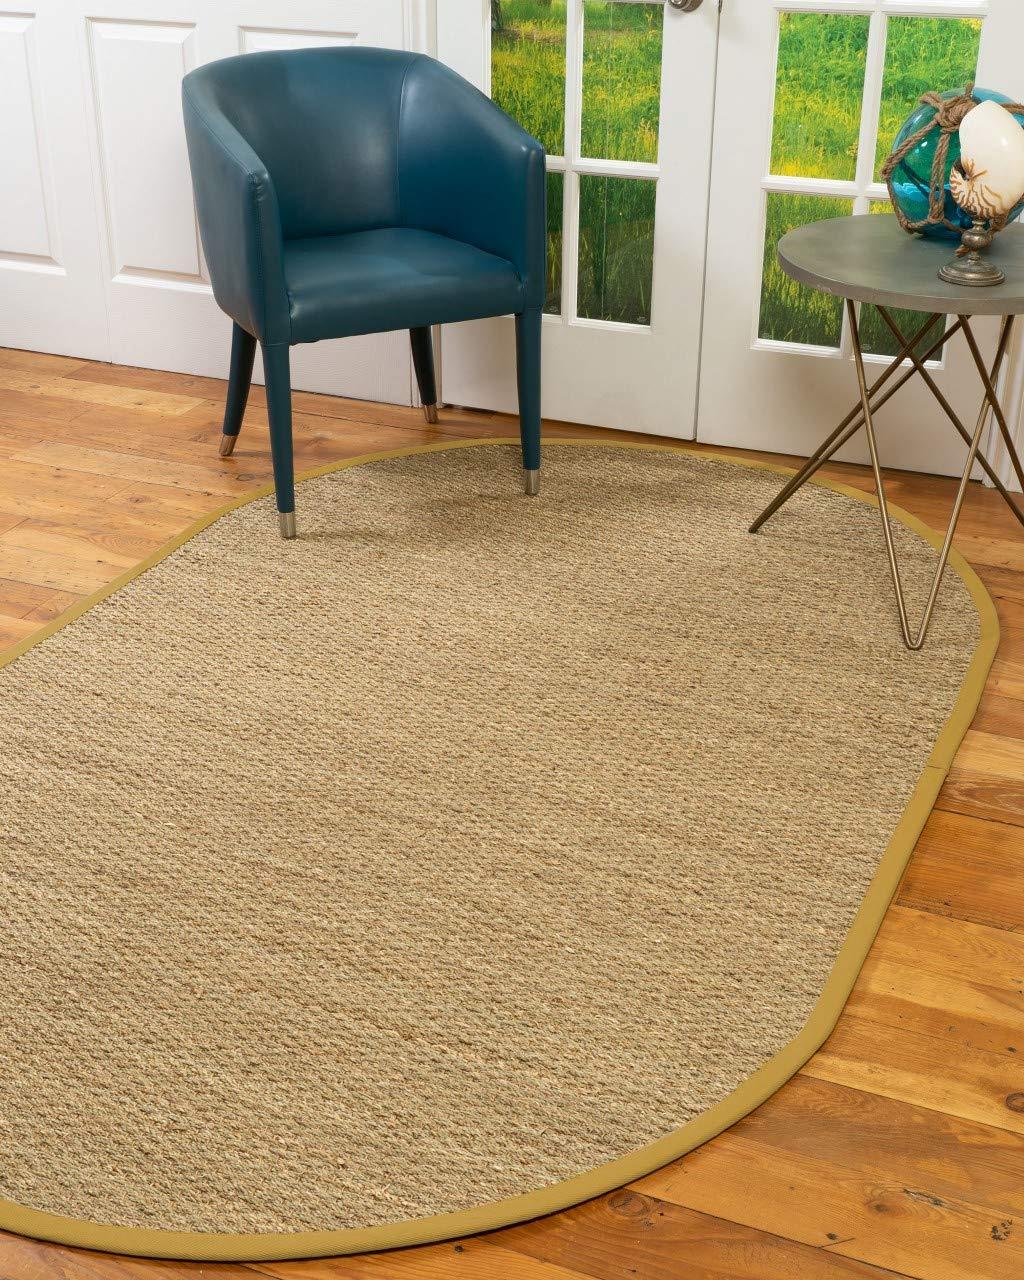 NaturalAreaRugs 100%, Natural Fiber Handmade Half Panama, Seagrass Rug, 5' x 8' Oval Tan Border